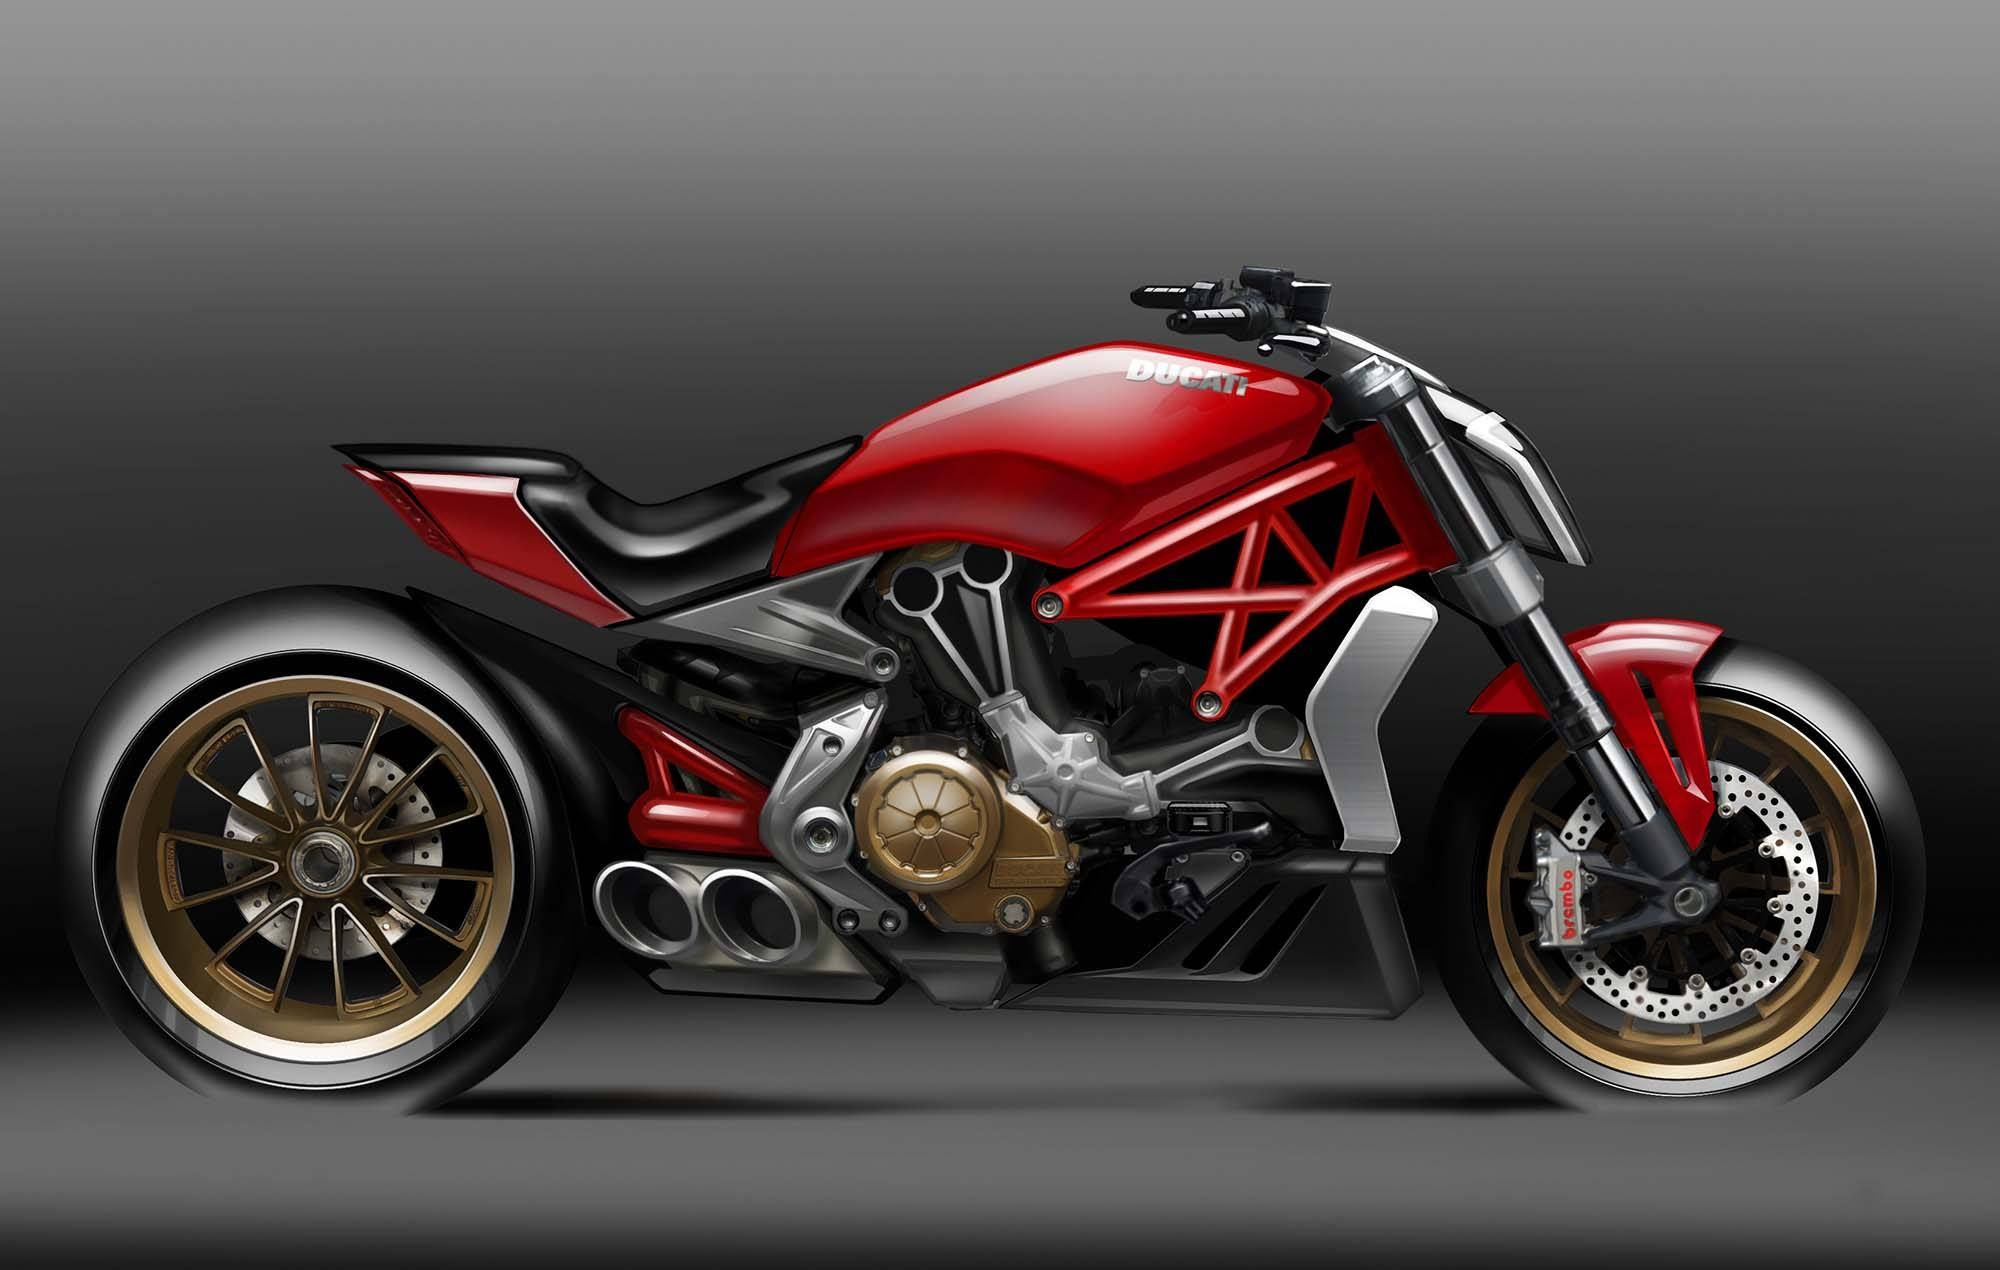 ducati diavel x - sketch | motorcycle | pinterest | ducati diavel